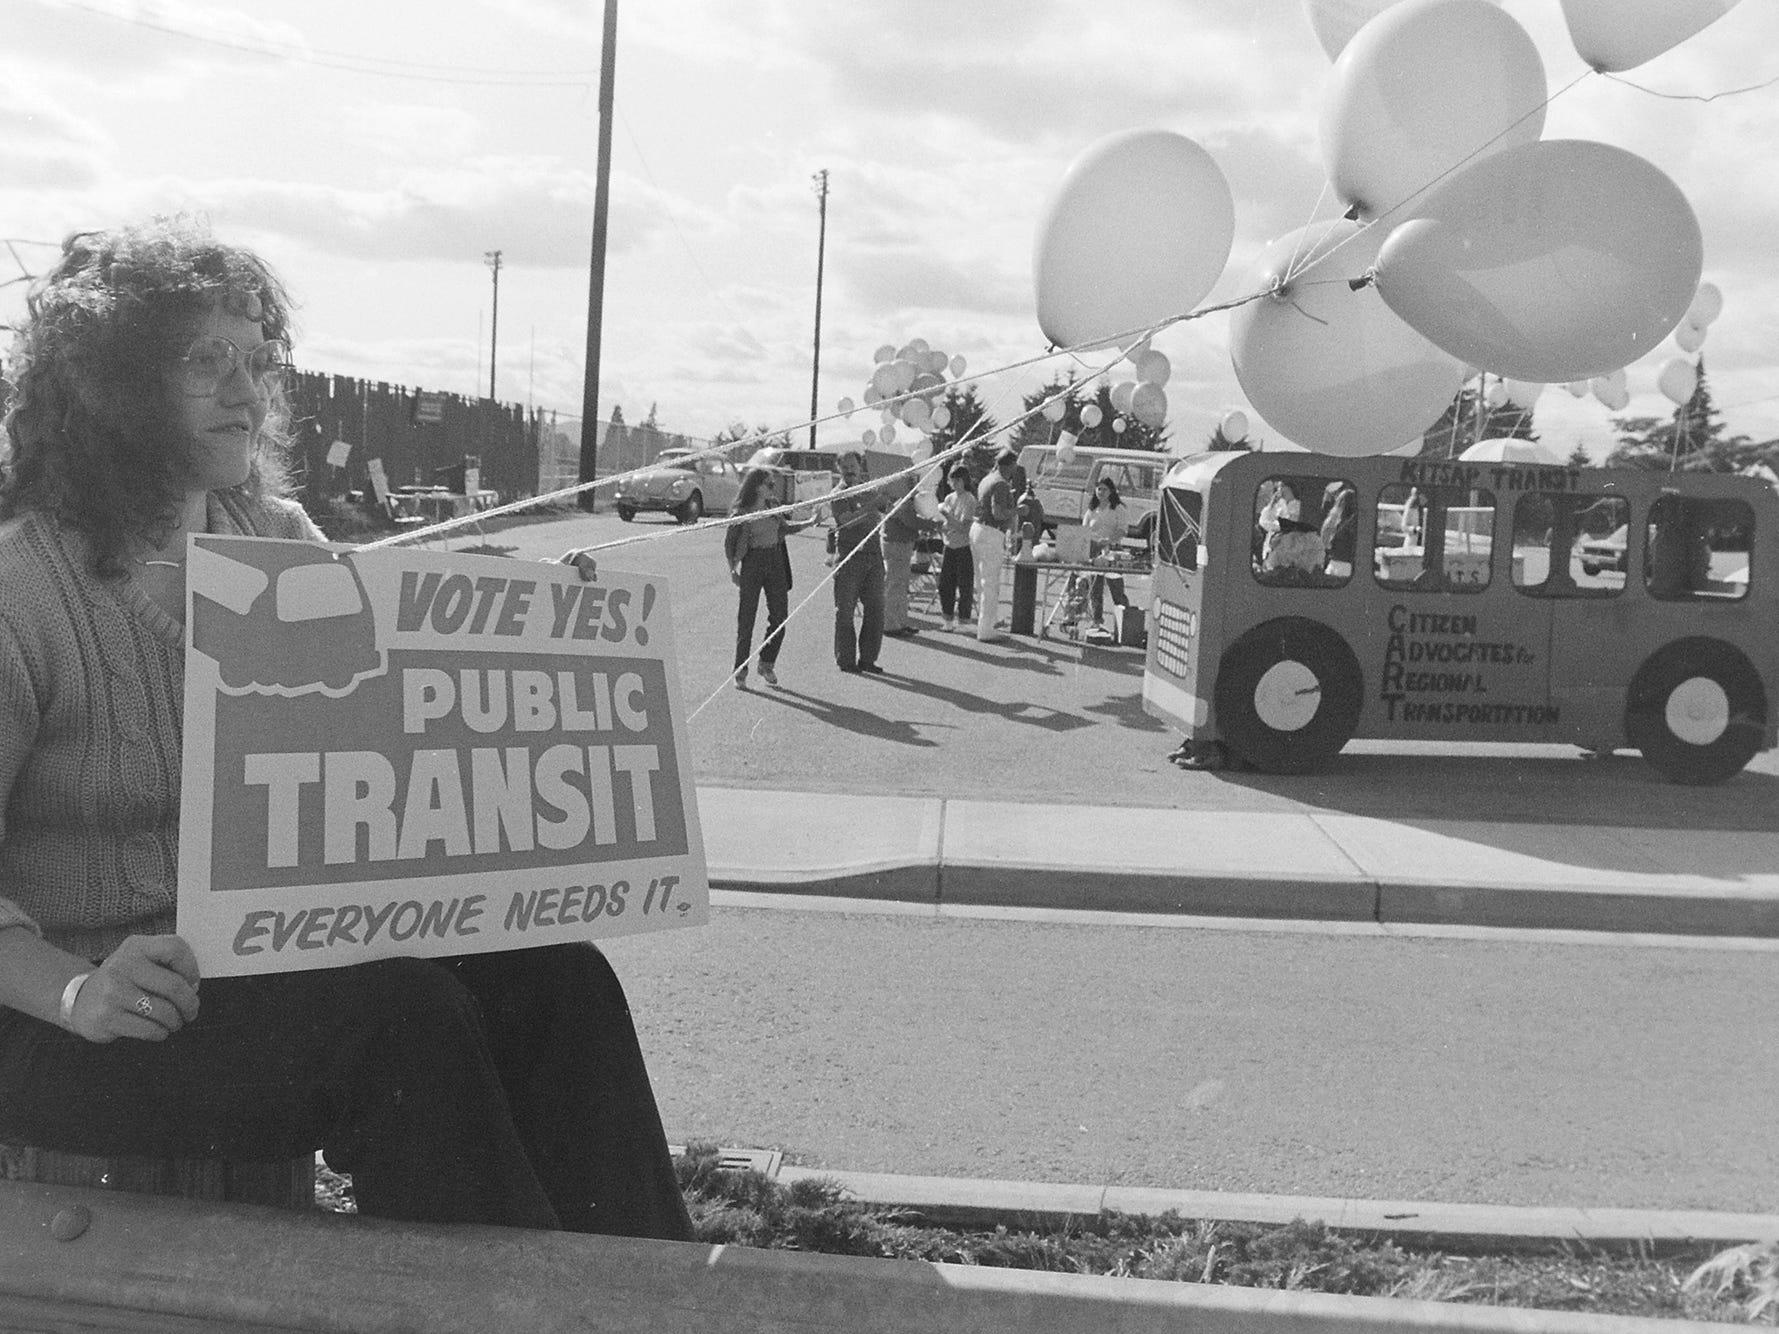 04/10/82Public Transit Demonstration